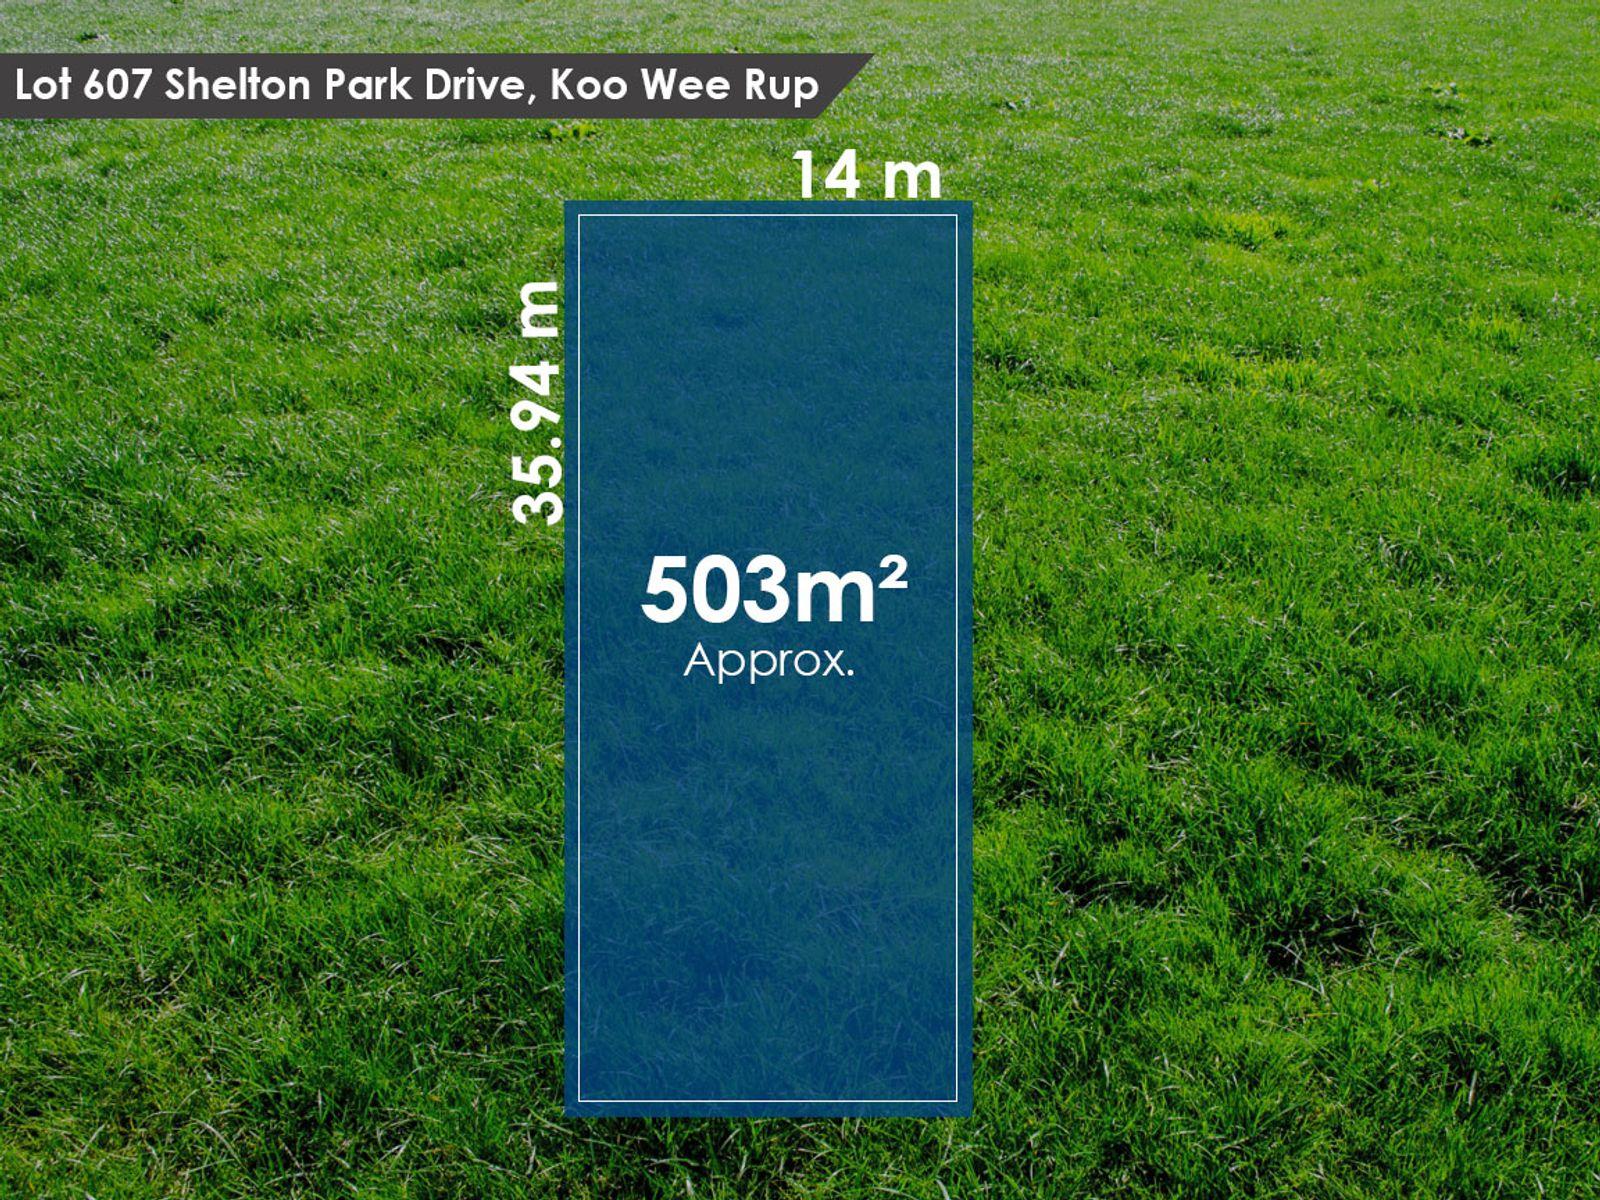 Lot 608 Shelton Park Drive, Koo Wee Rup, VIC 3981